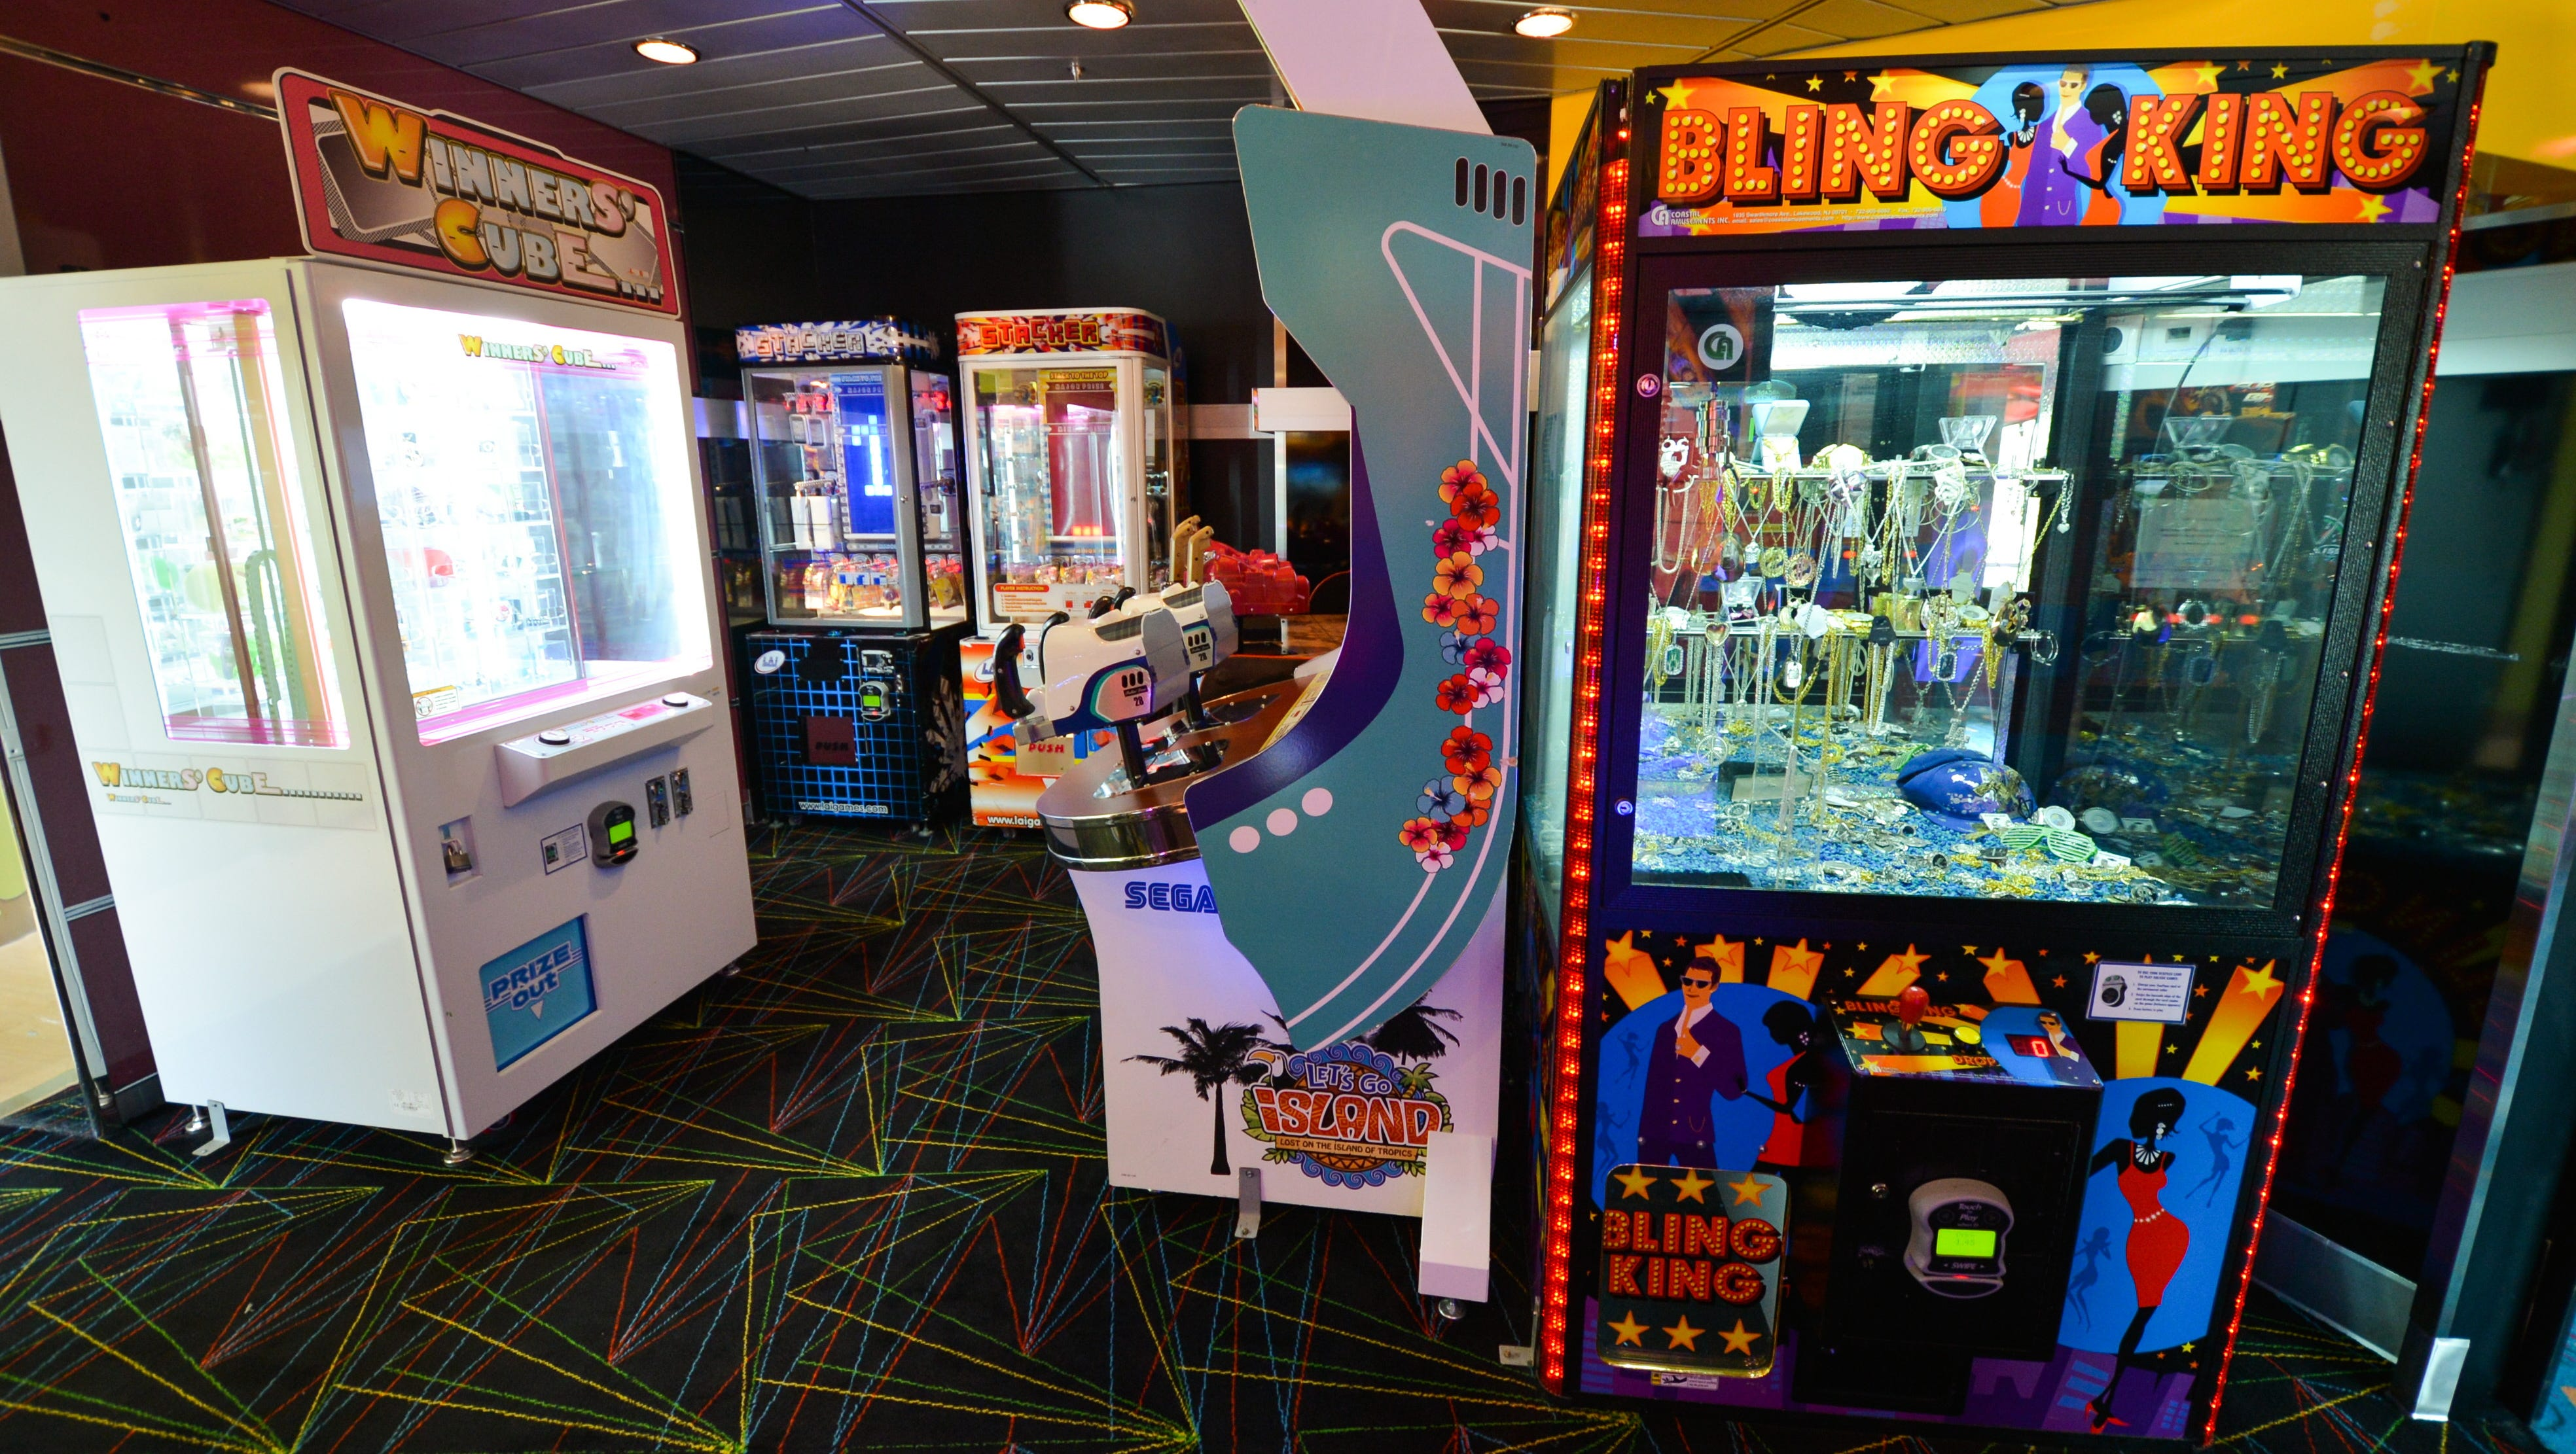 The Deck 10 arcade.